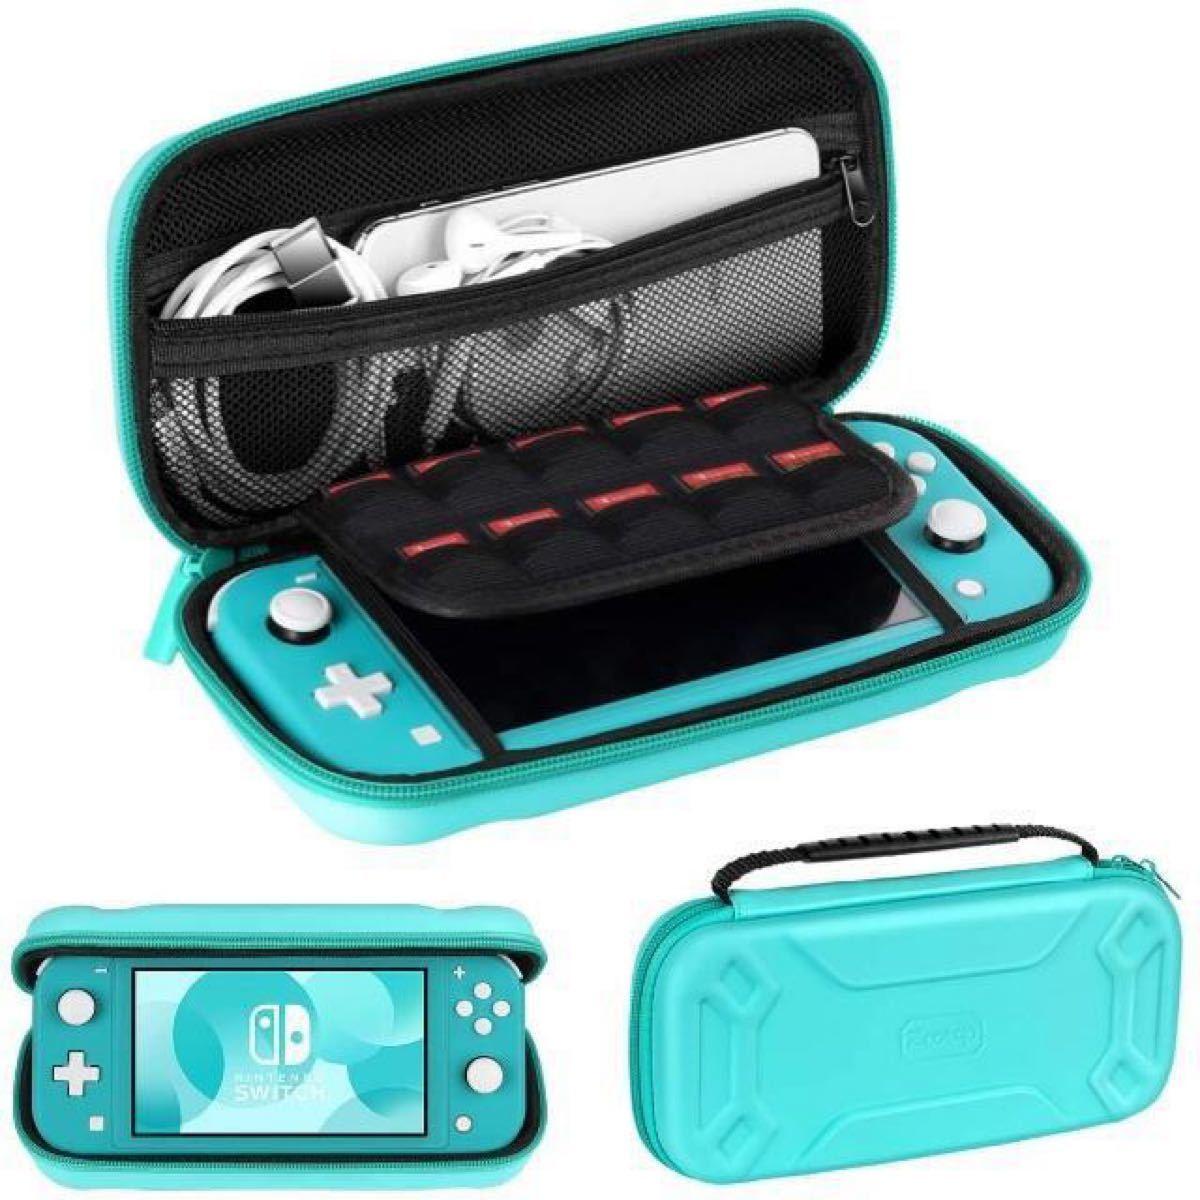 Nintendo Switch 任天堂スイッチケース 任天堂スイッチ 収納バッグ